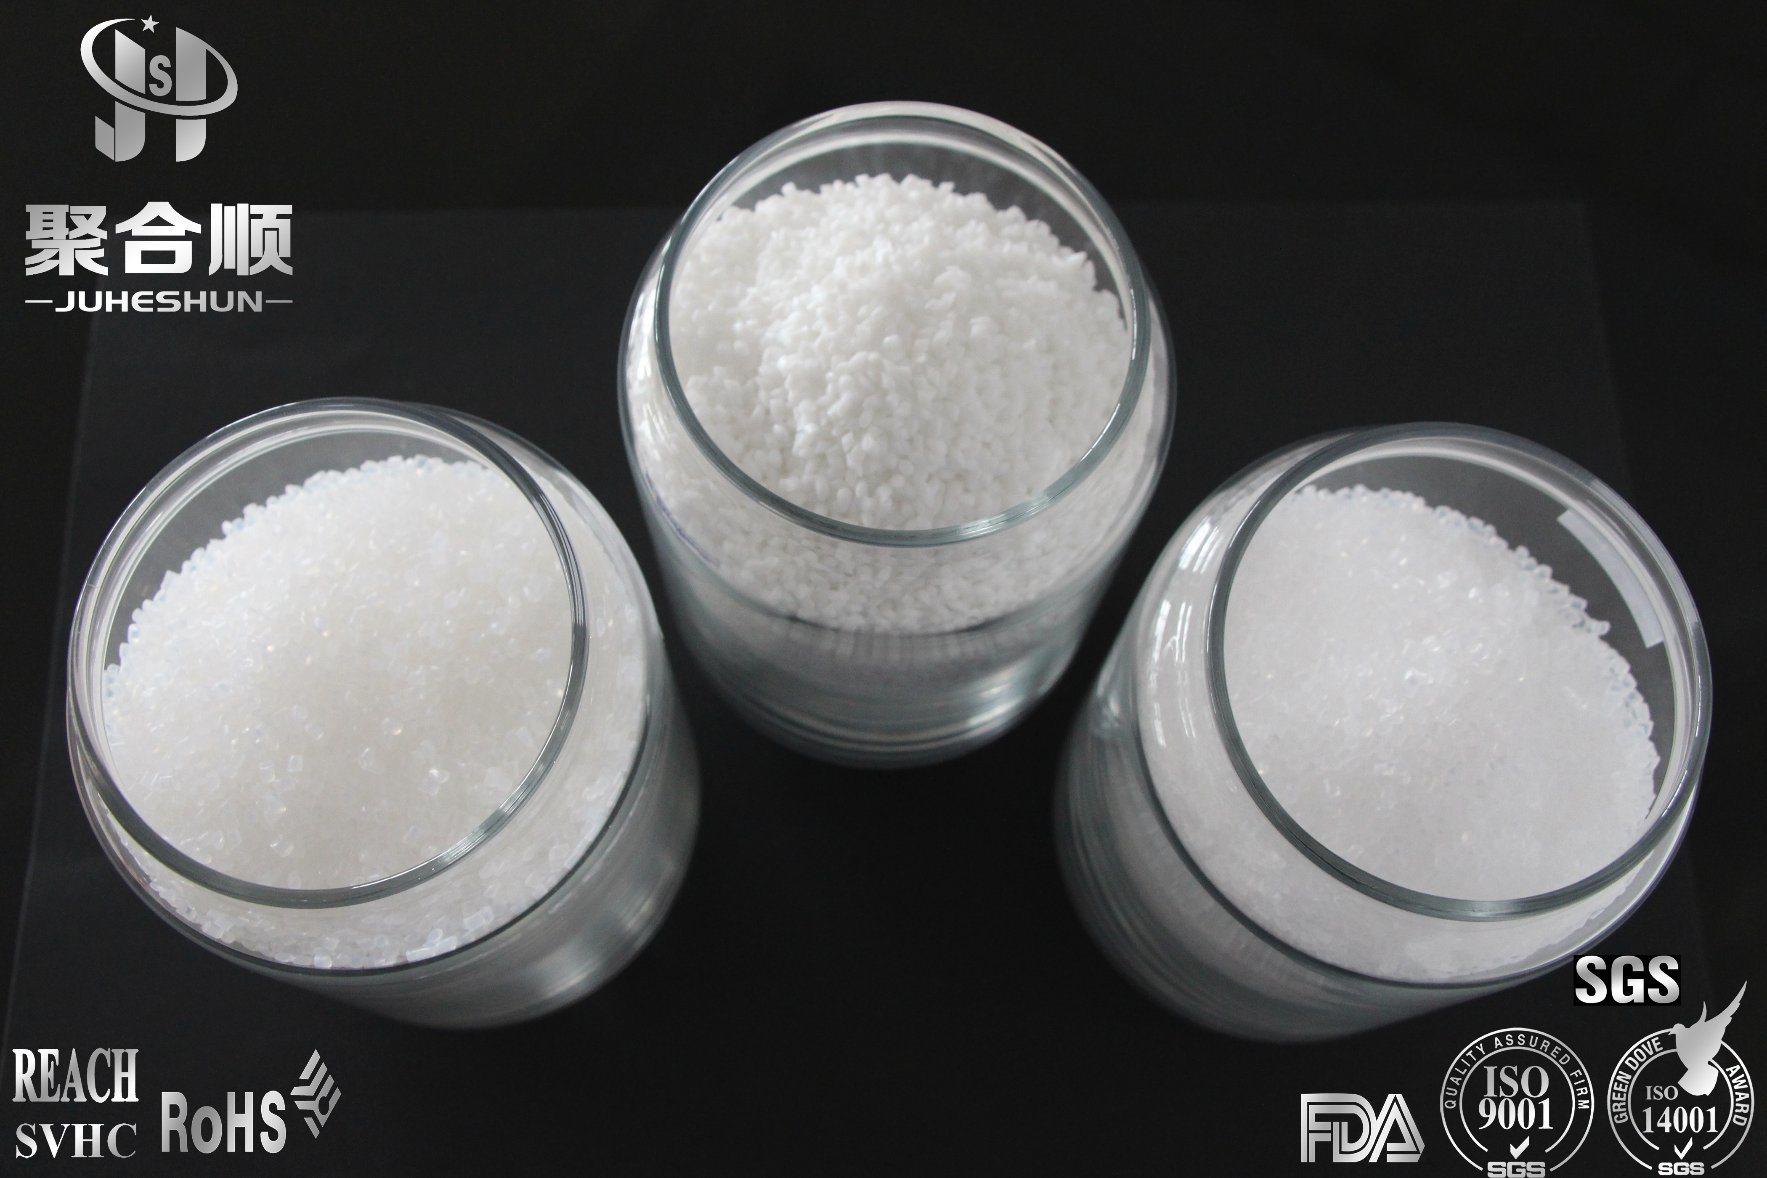 J3200m/Film-Graded Nylon 6 Slice//Nylon 6 Chips/Polyamide 6 Granules/Pellets/Nylon6 Granules/PA6